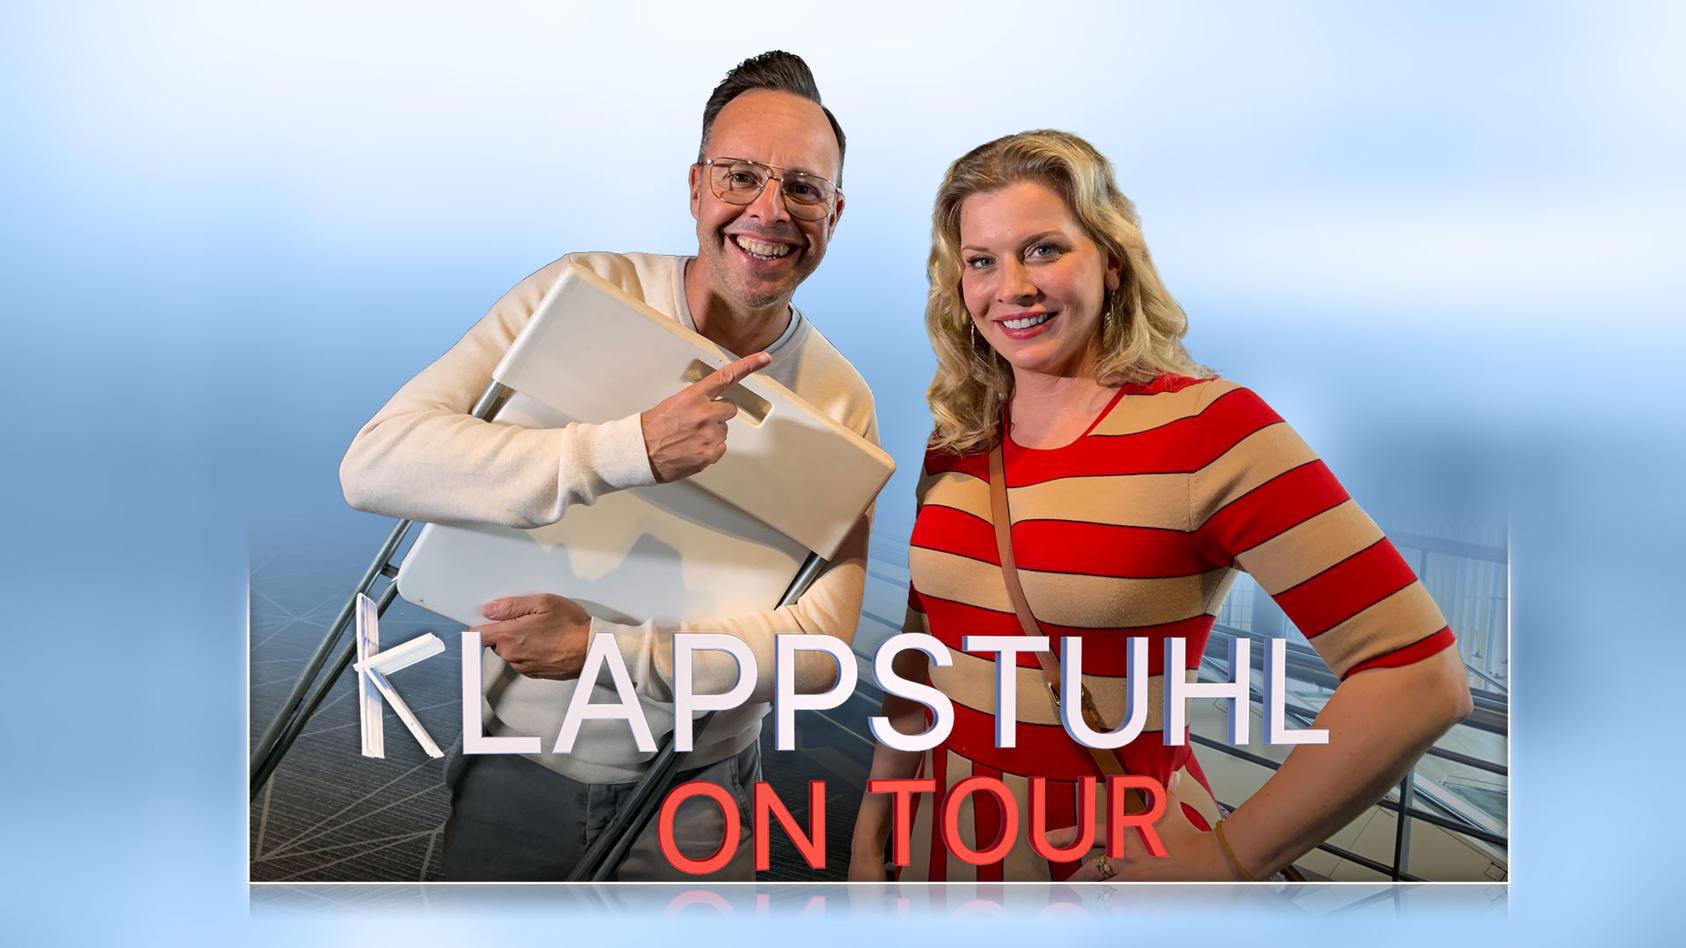 klappstuhl-on-tour-till-quitmann-trifft-eva-habermann